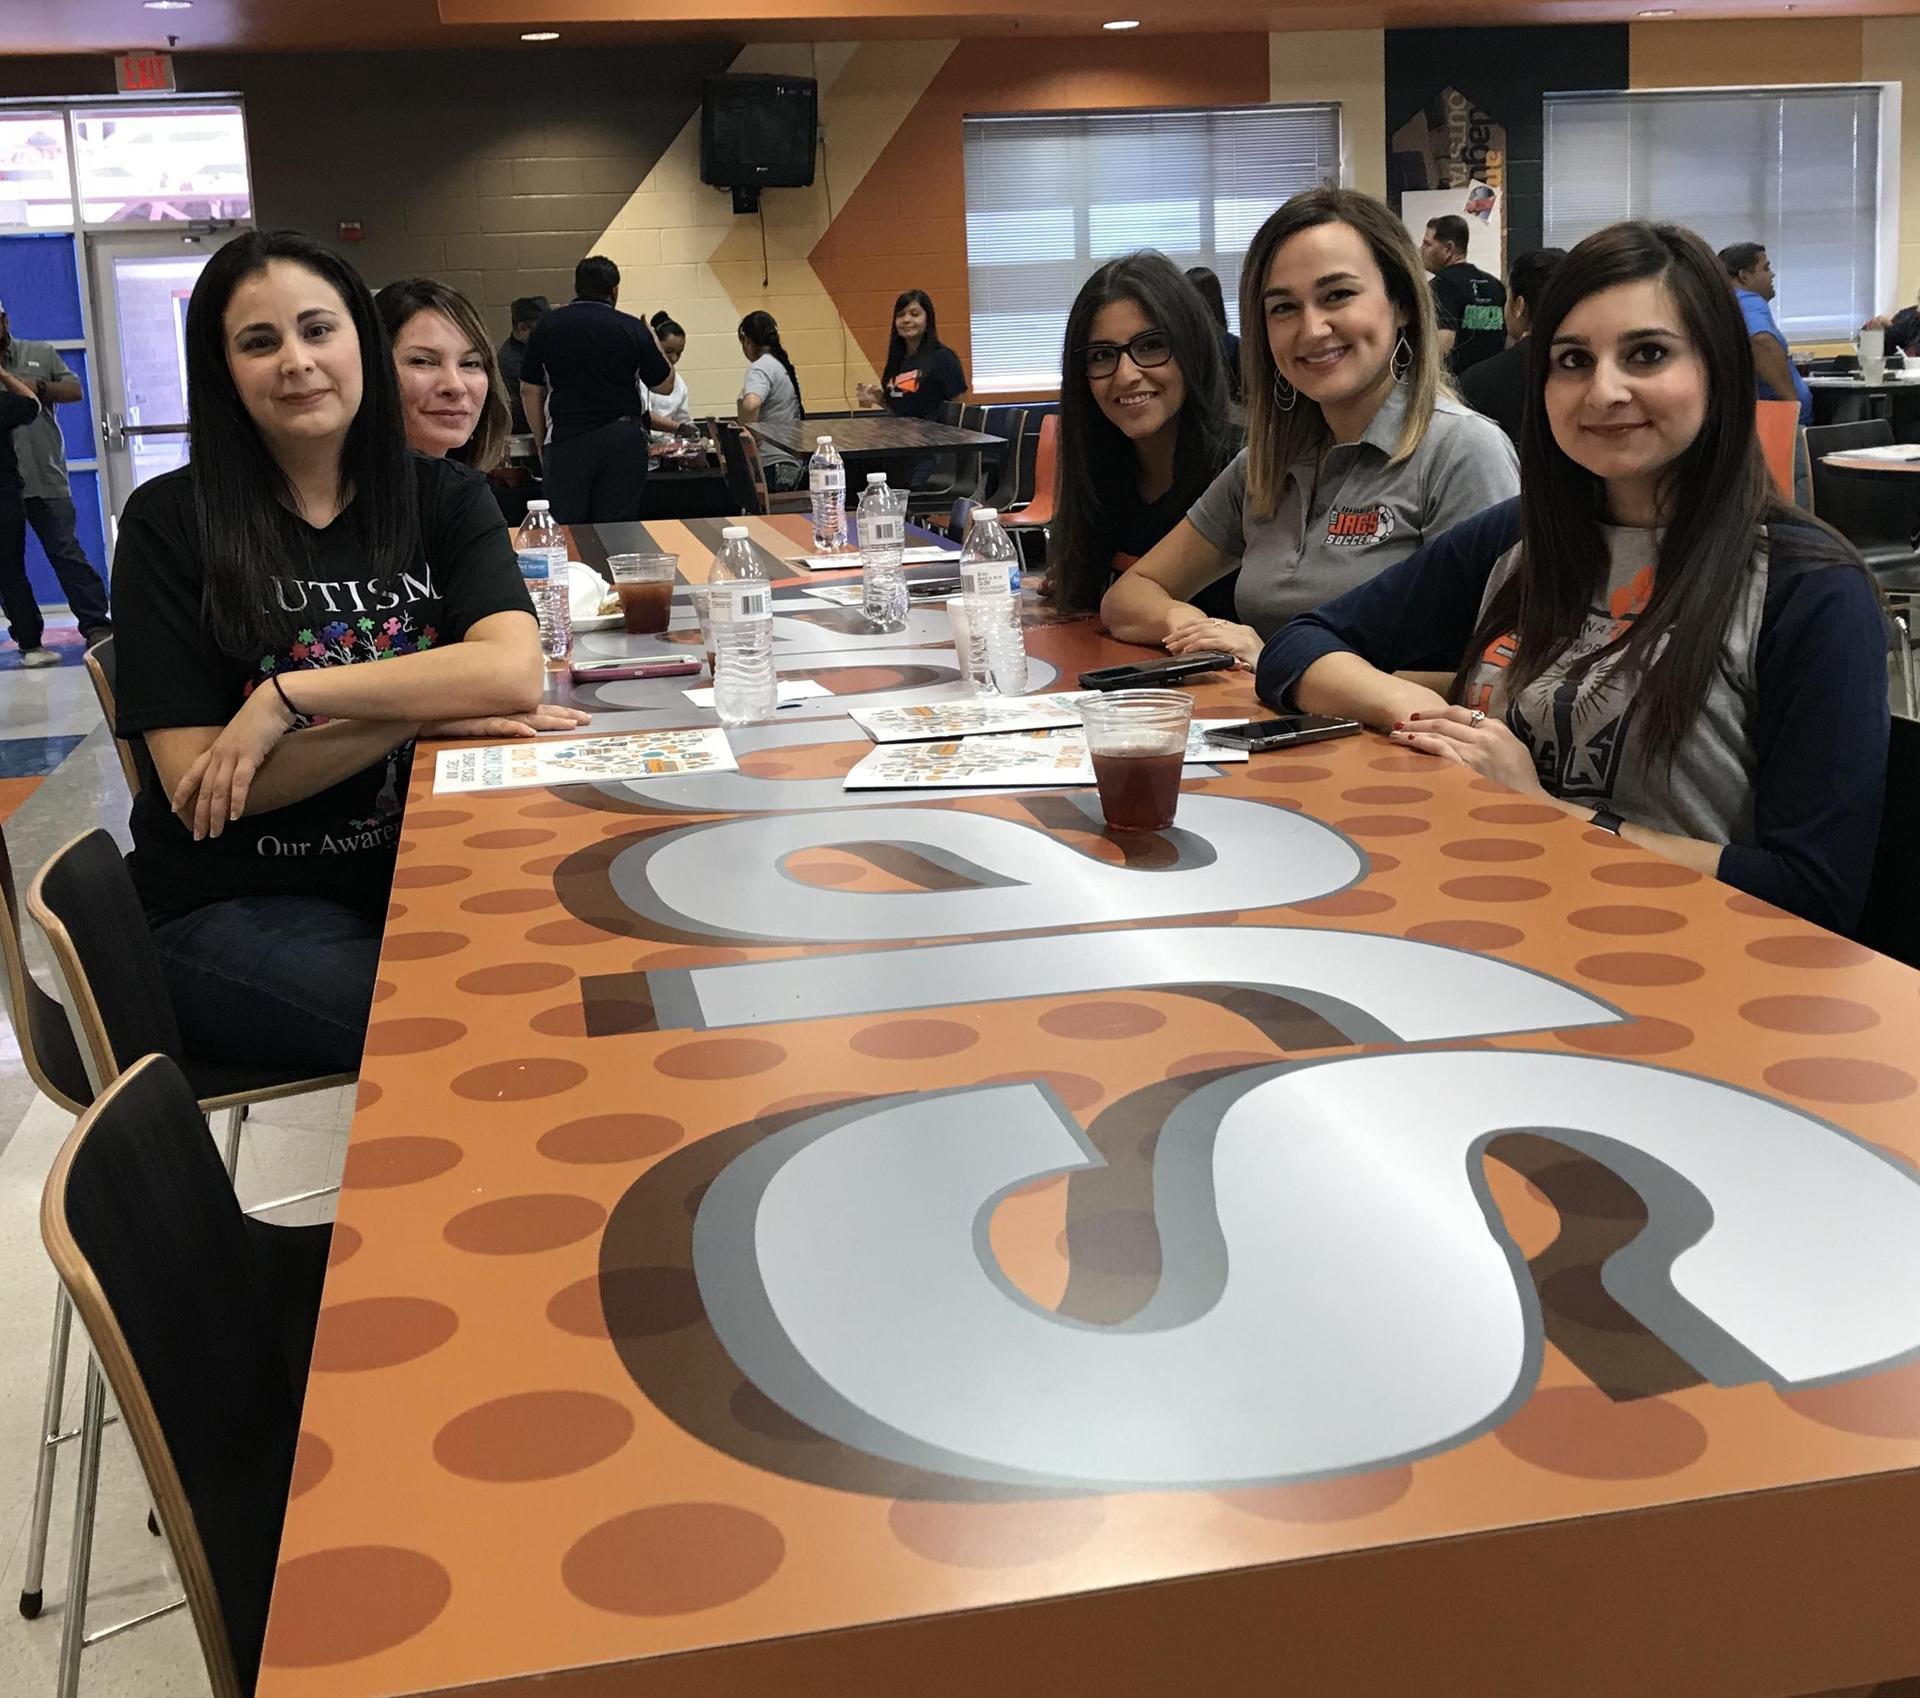 Teachers at JEHS Cafe